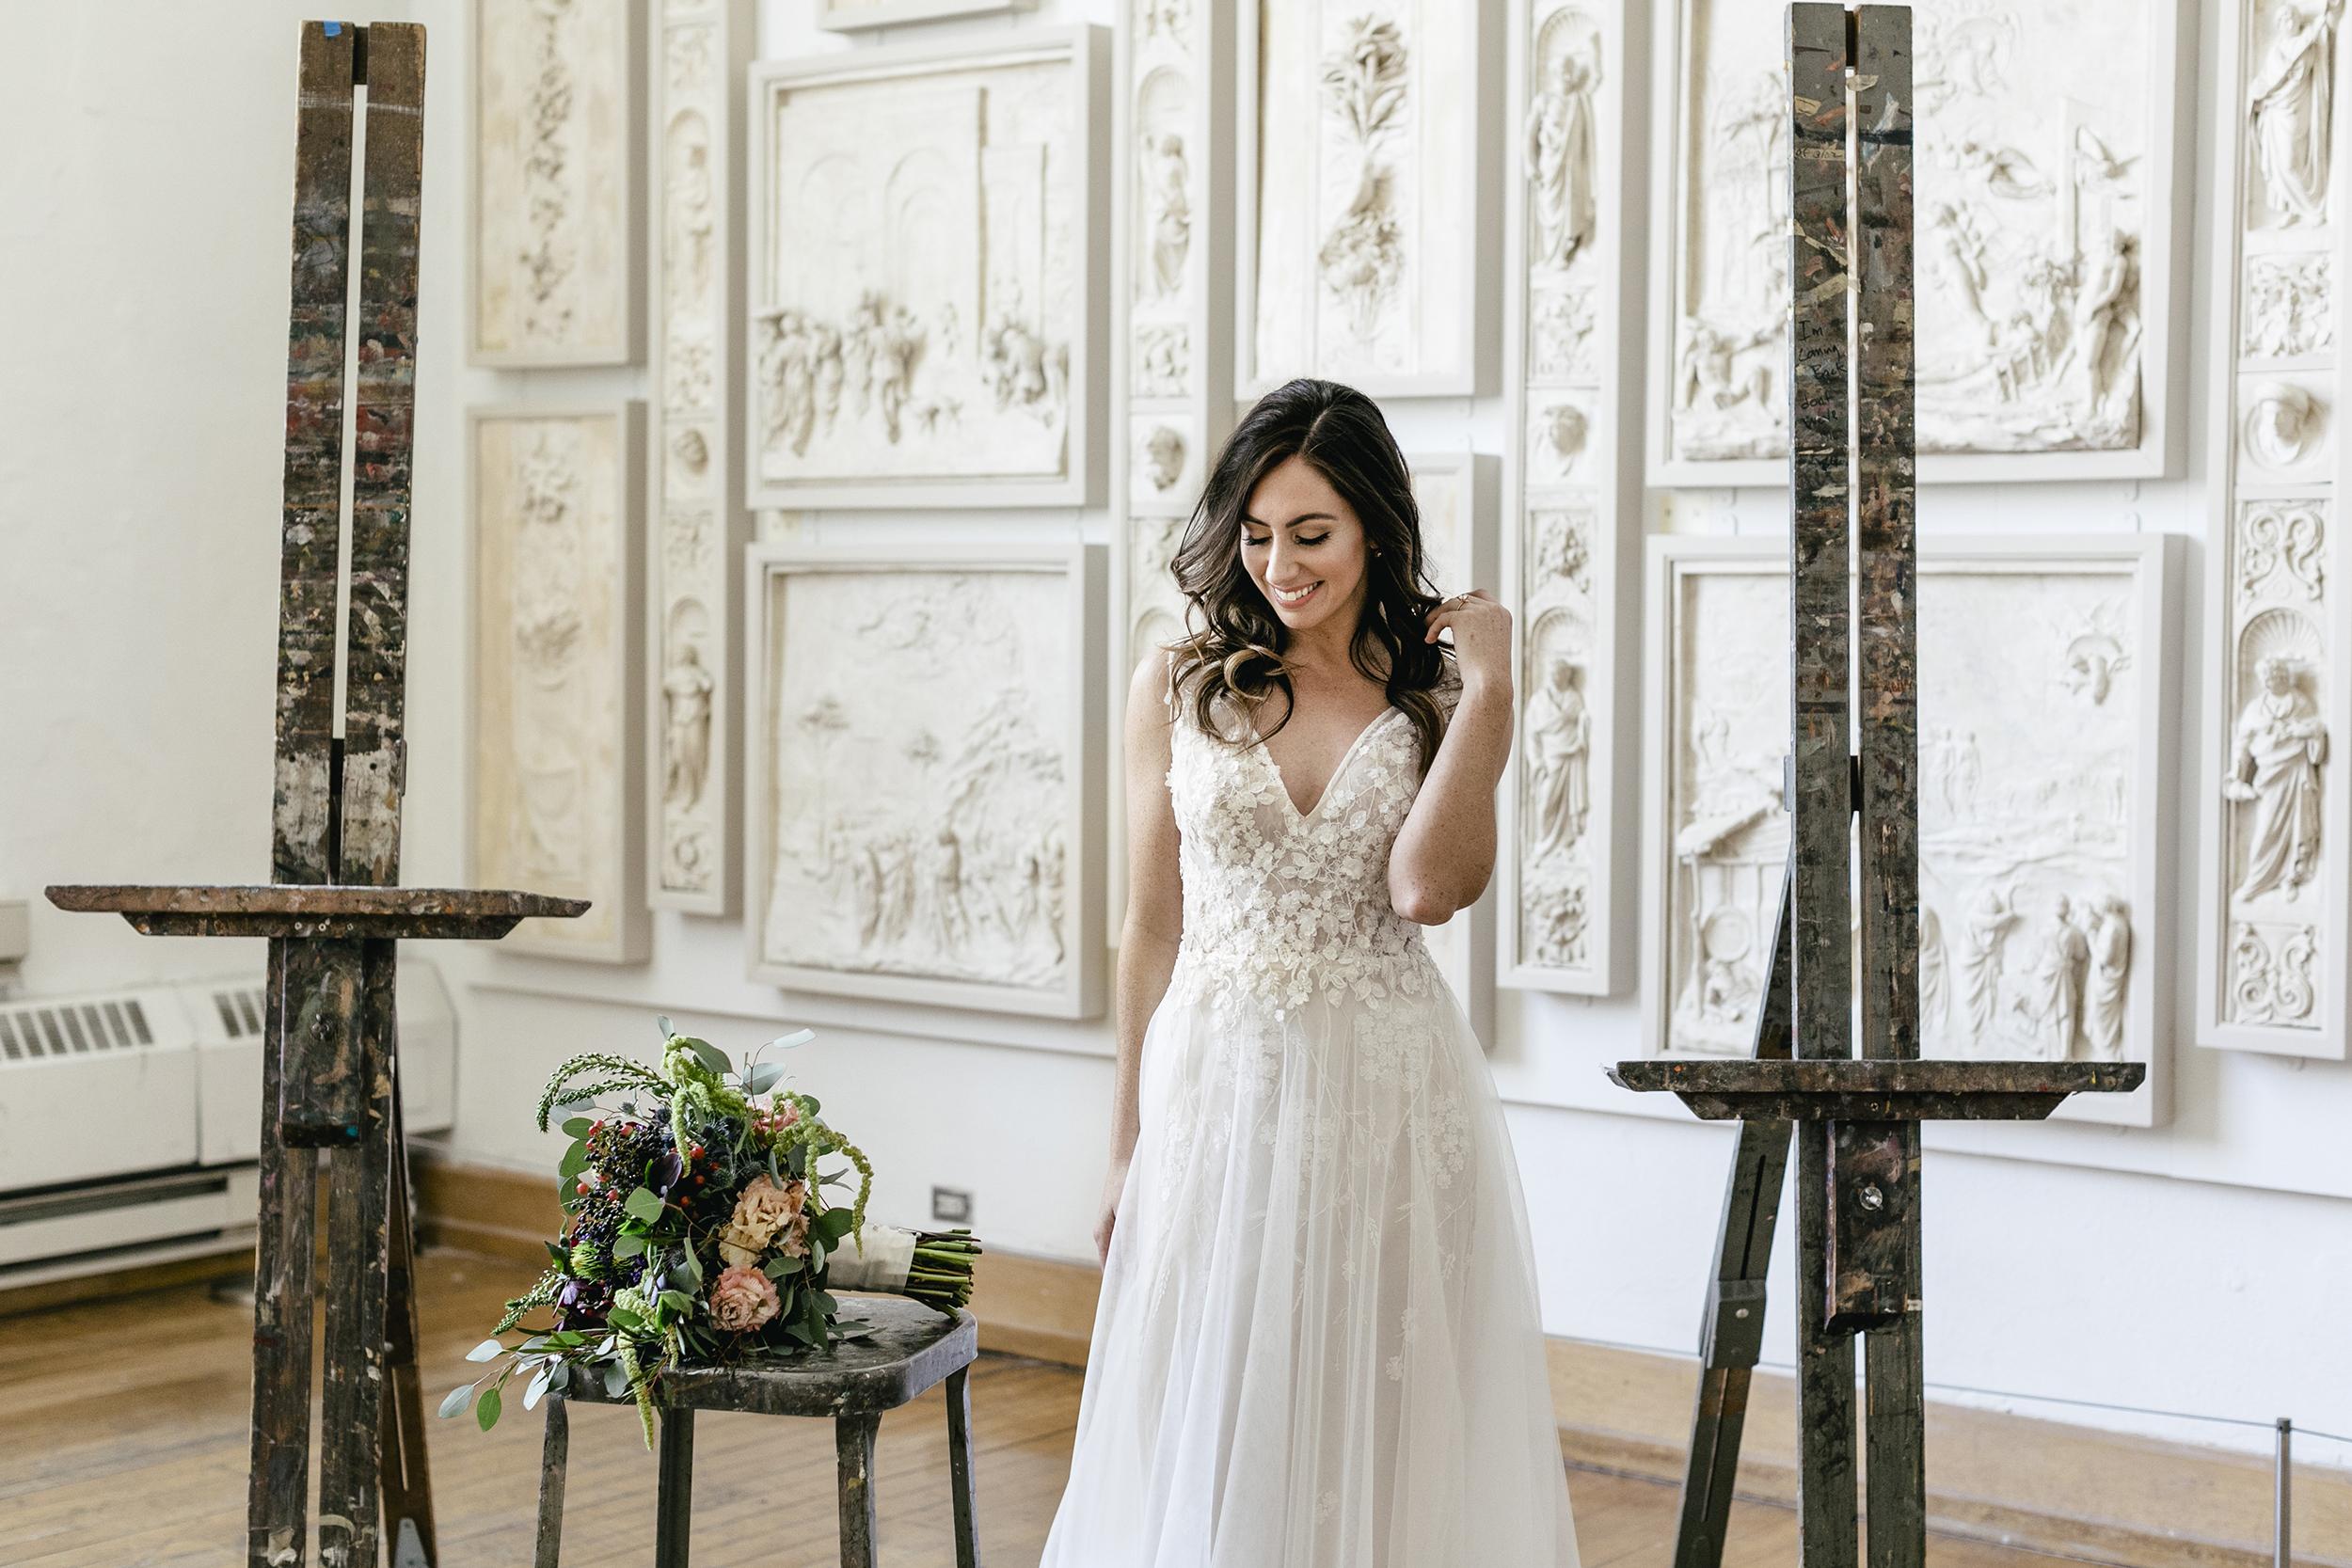 photography-wedding-weddings-natural-candid-pafa-pennsylvania academy-philadephia-philly-philadelphia wedding-mixed race-editorial-modern-fine-art-026.JPG